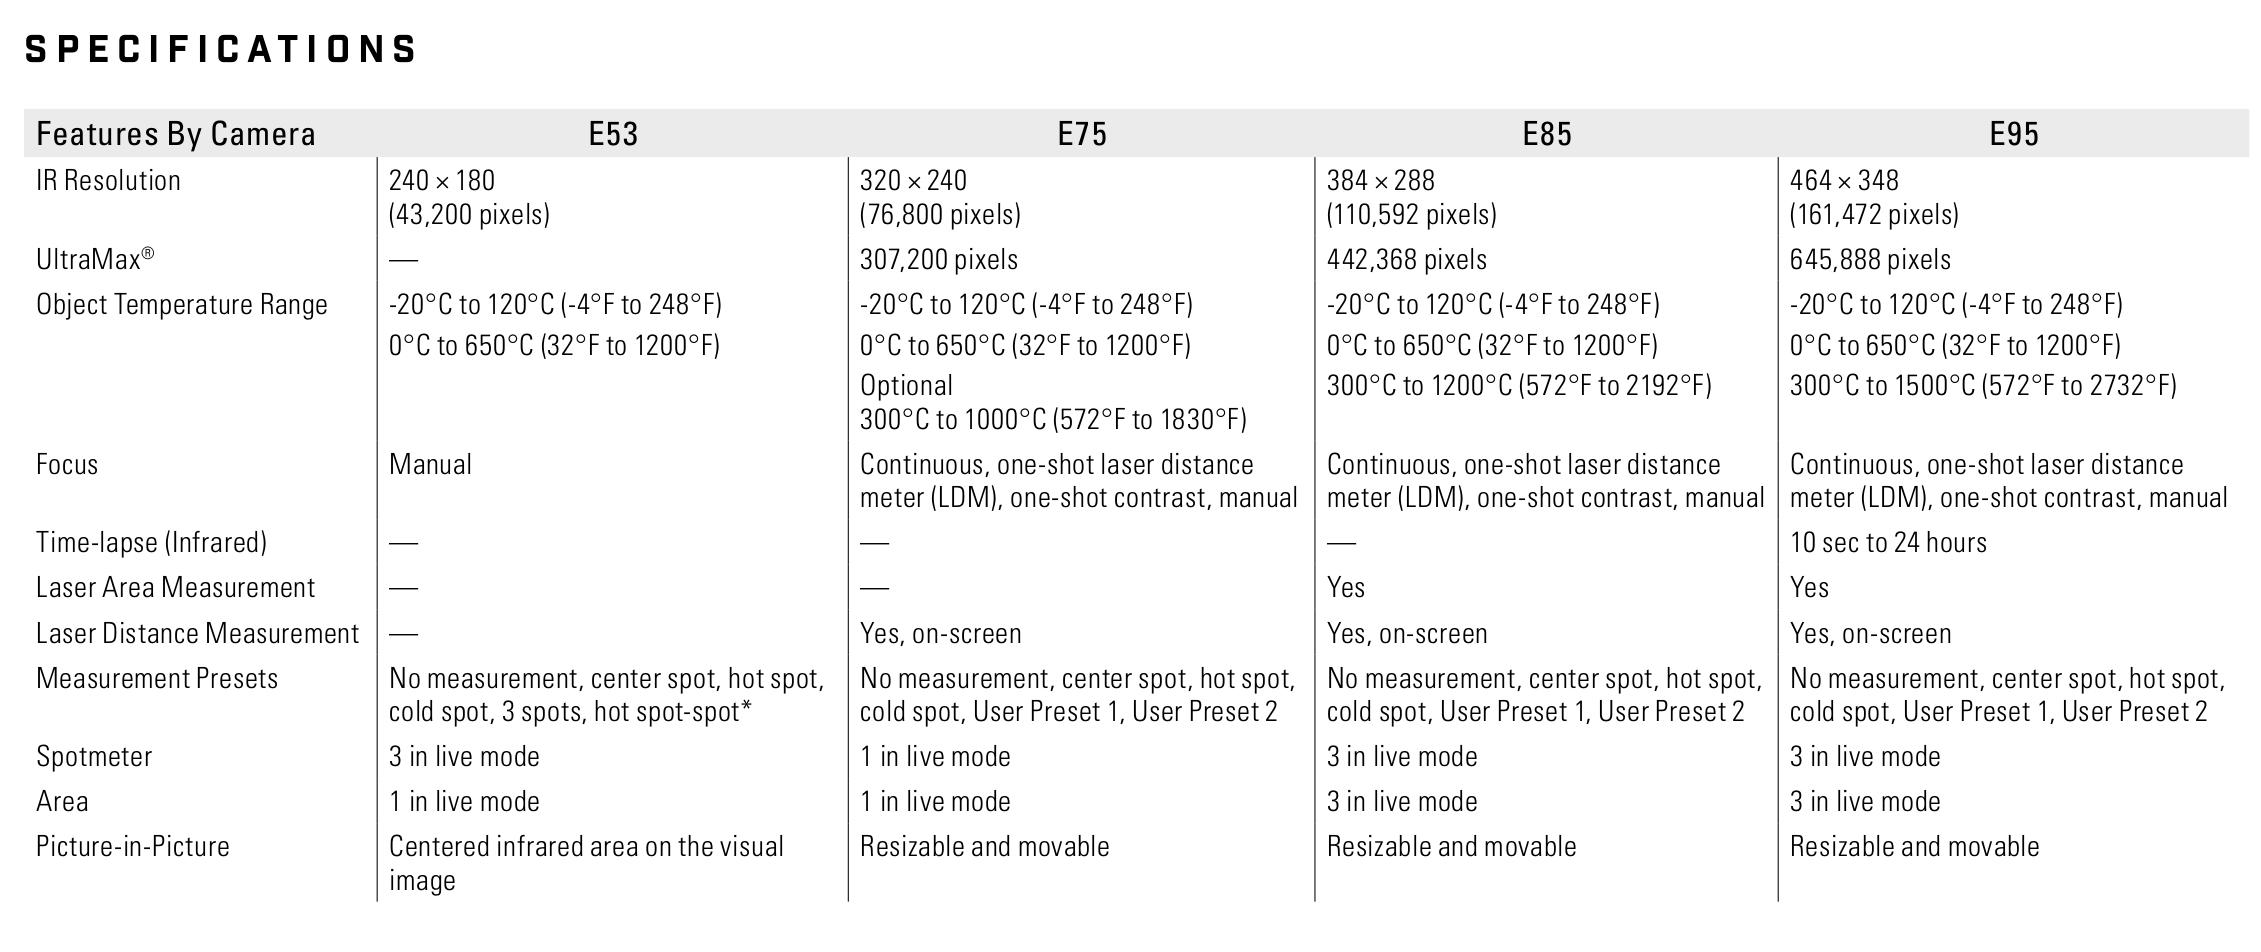 FLIR Exx-Series Comparison